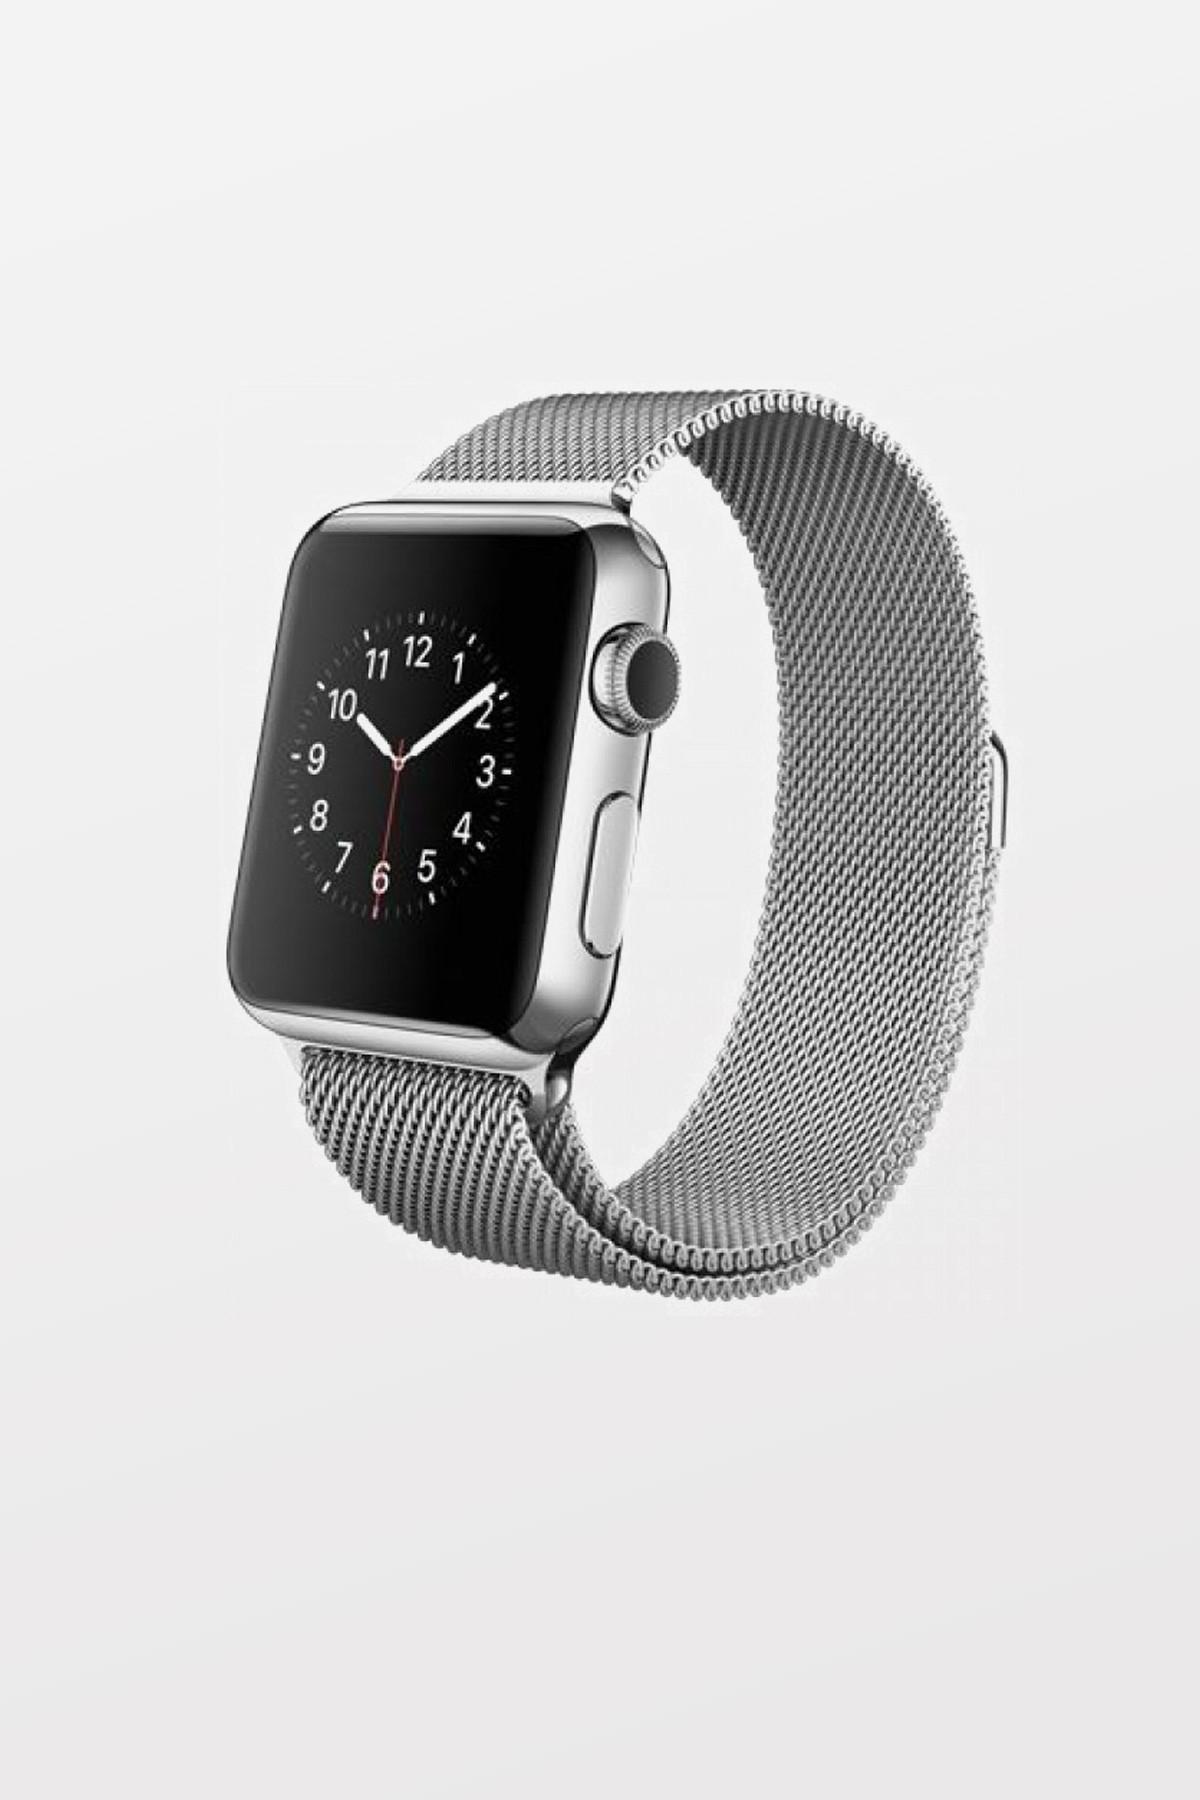 Apple Watch 38mm - Stainless Steel - Silver Link Bracelet - Refurbished